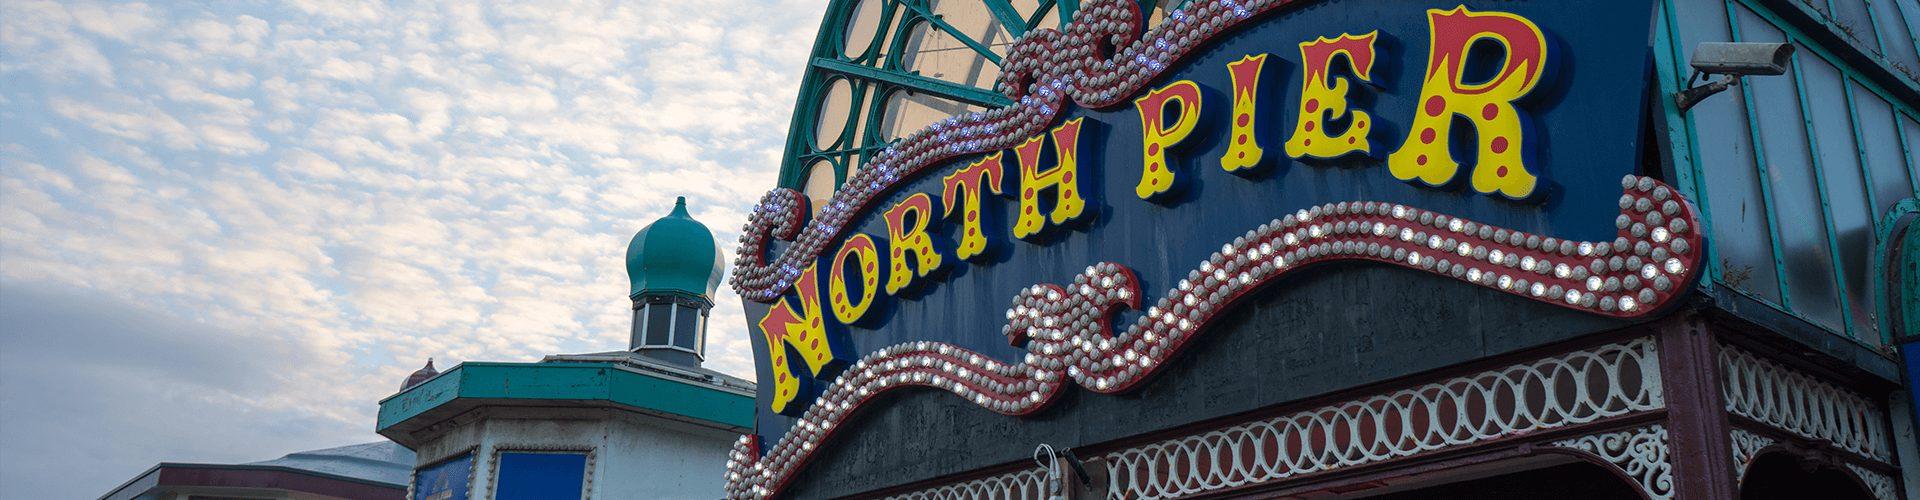 NorthPier1